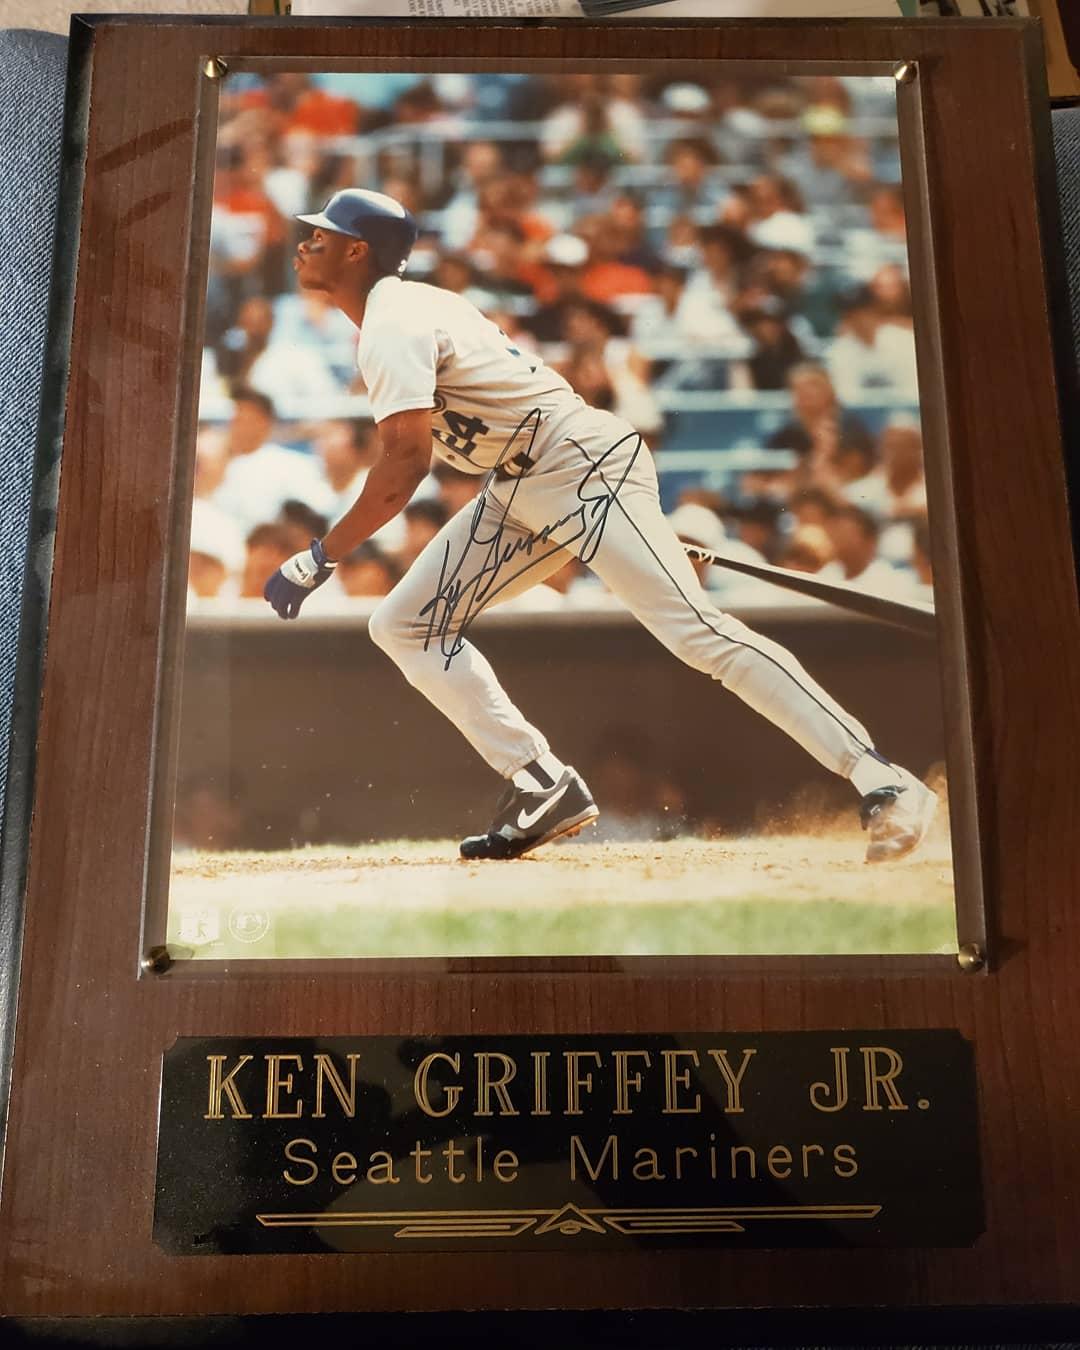 Happy 50th birthday to Ken Griffey Jr.